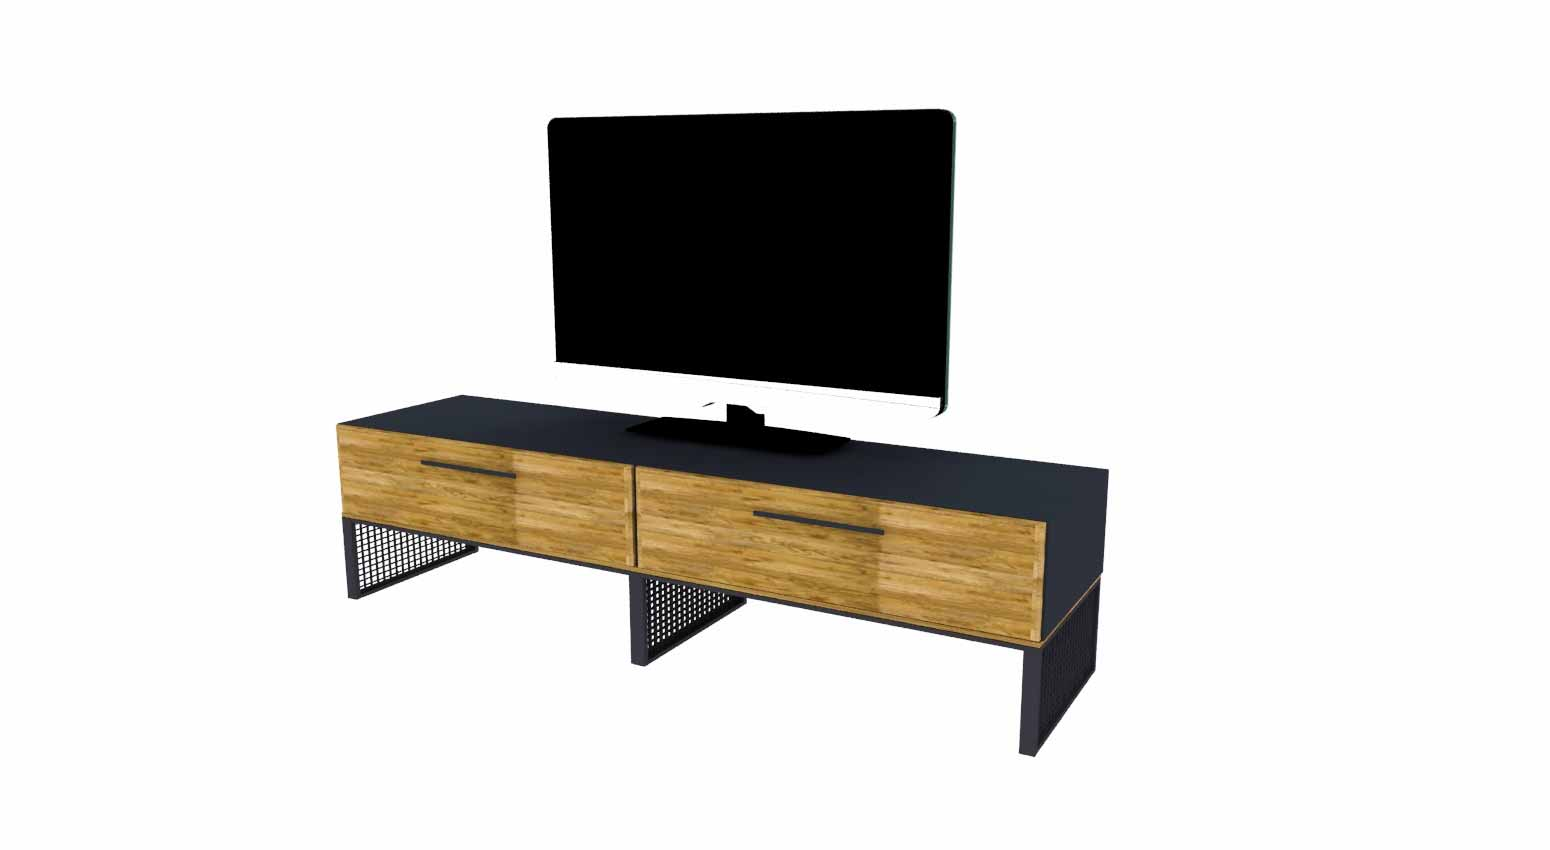 ah ap atolyesi utah tv sehpas 140 cm. Black Bedroom Furniture Sets. Home Design Ideas